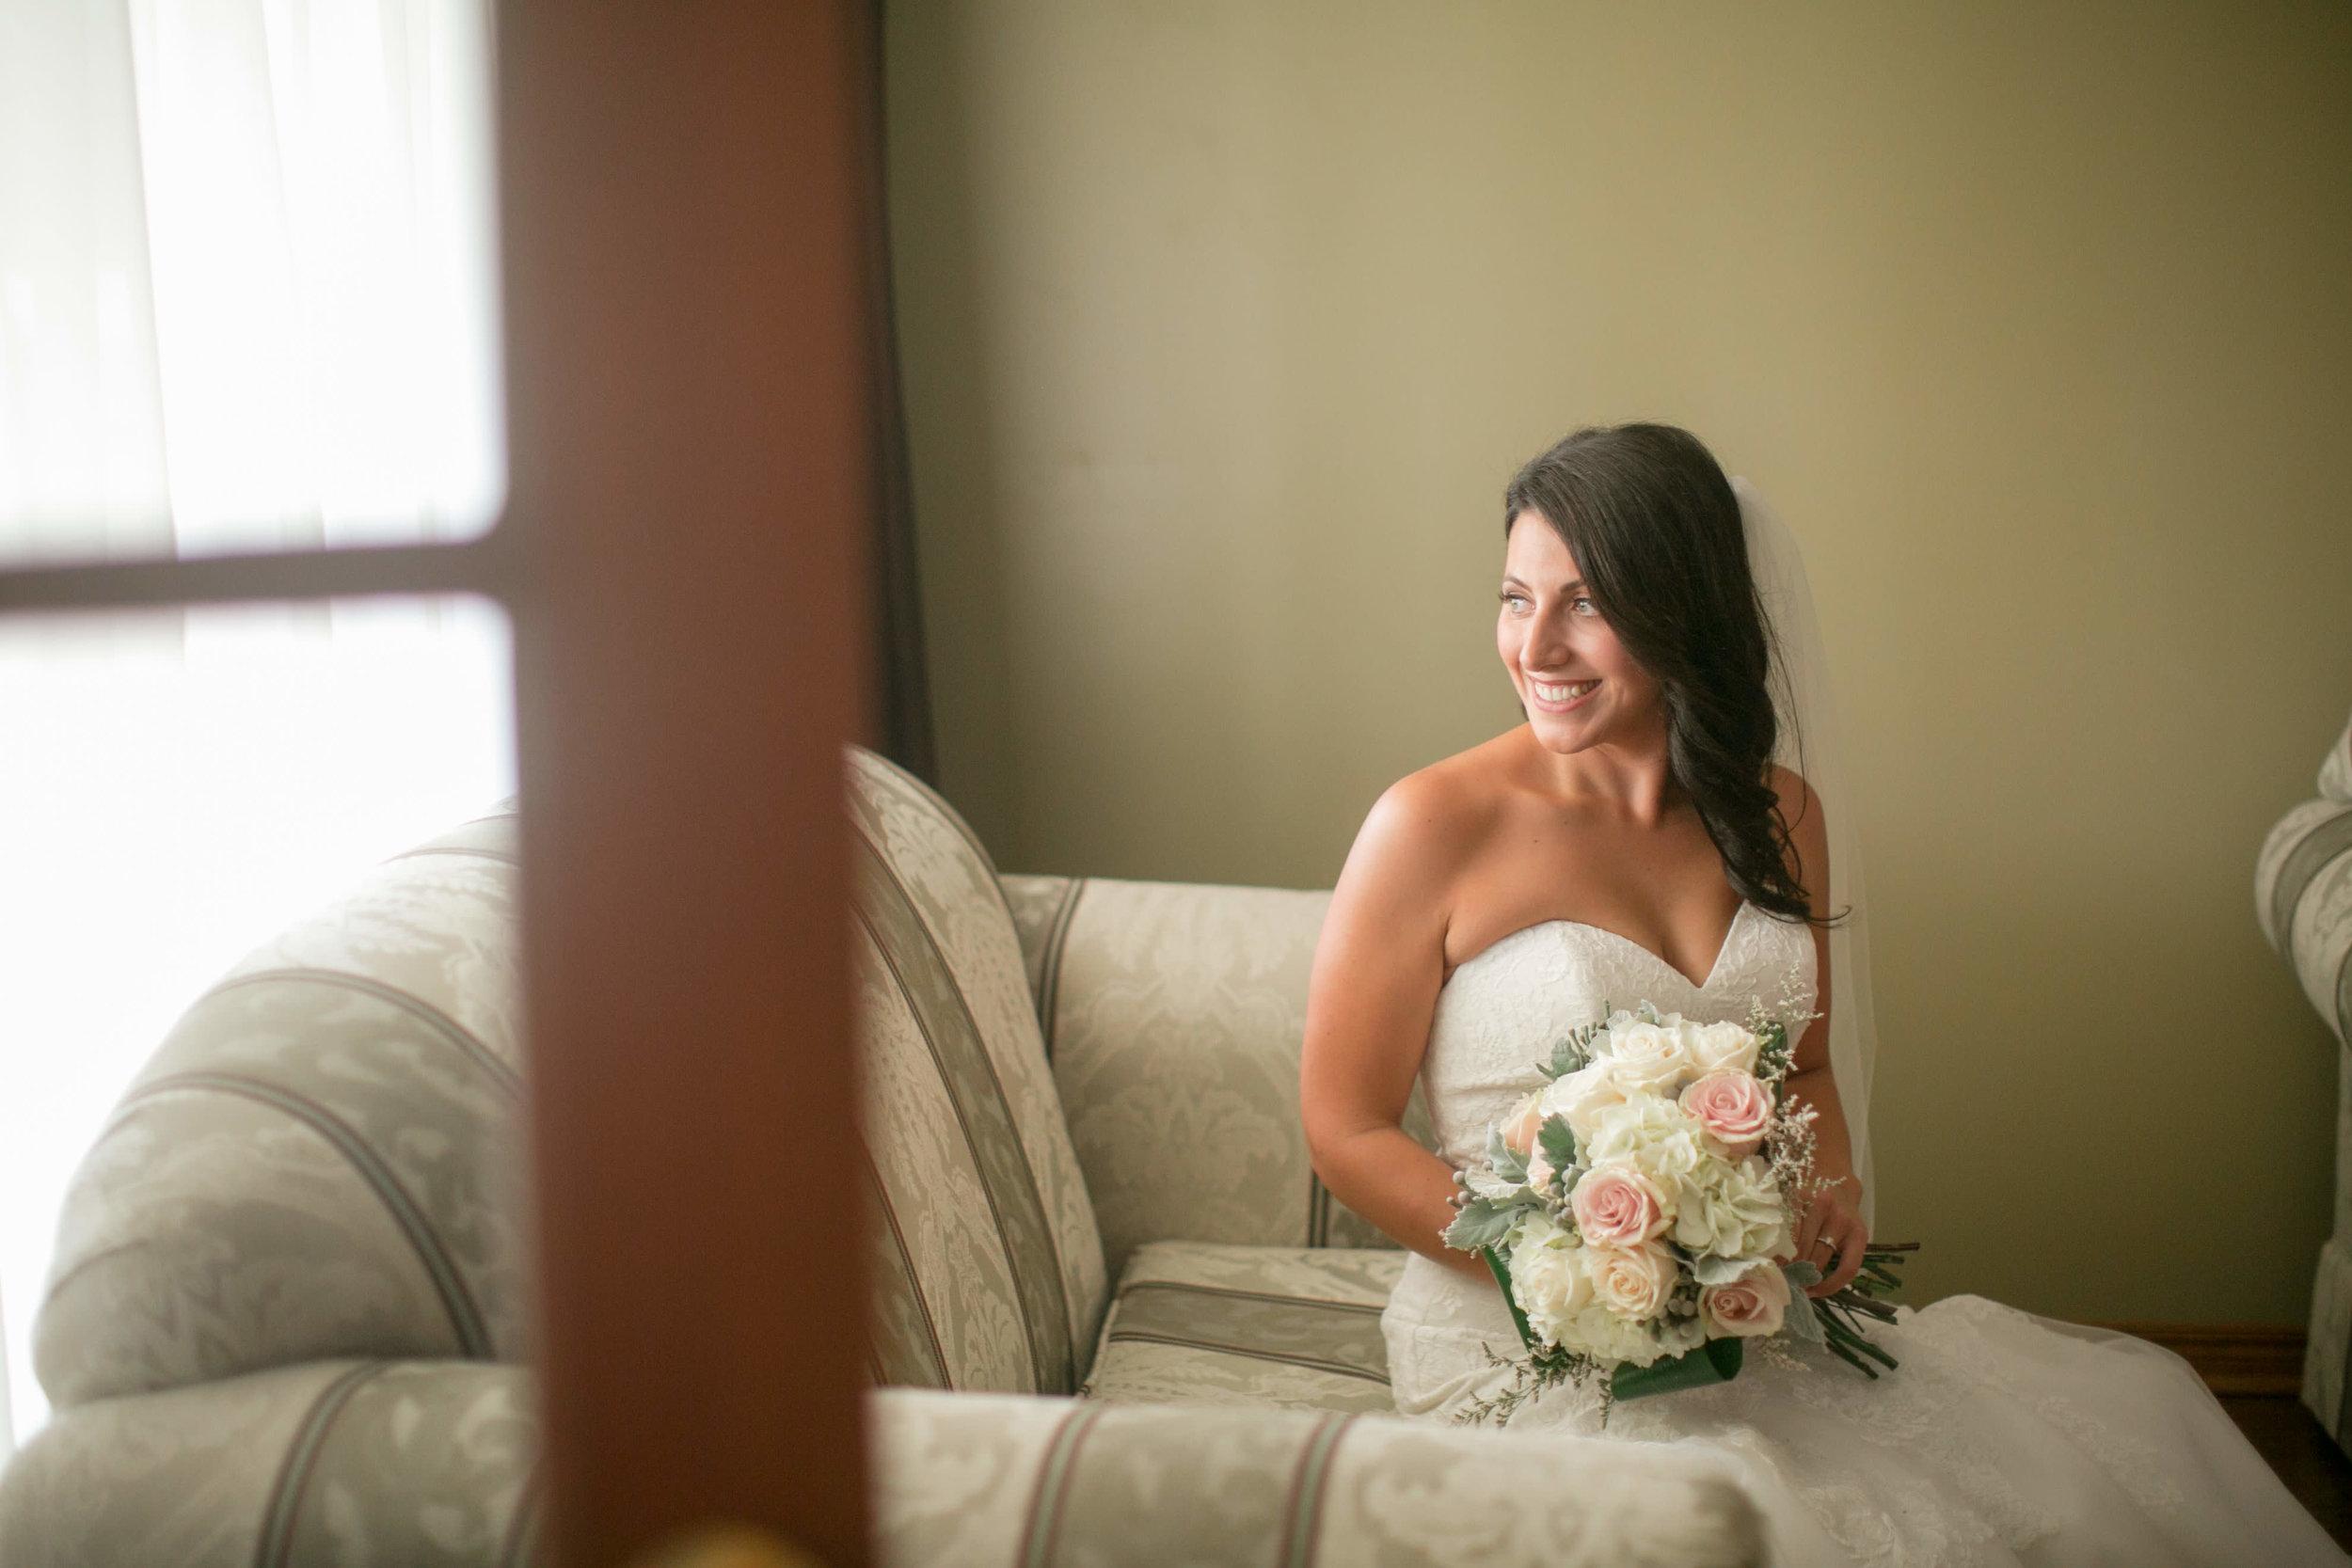 Stefanie___Bernard___Daniel_Ricci_Weddings_High_Res._Finals__178.jpg